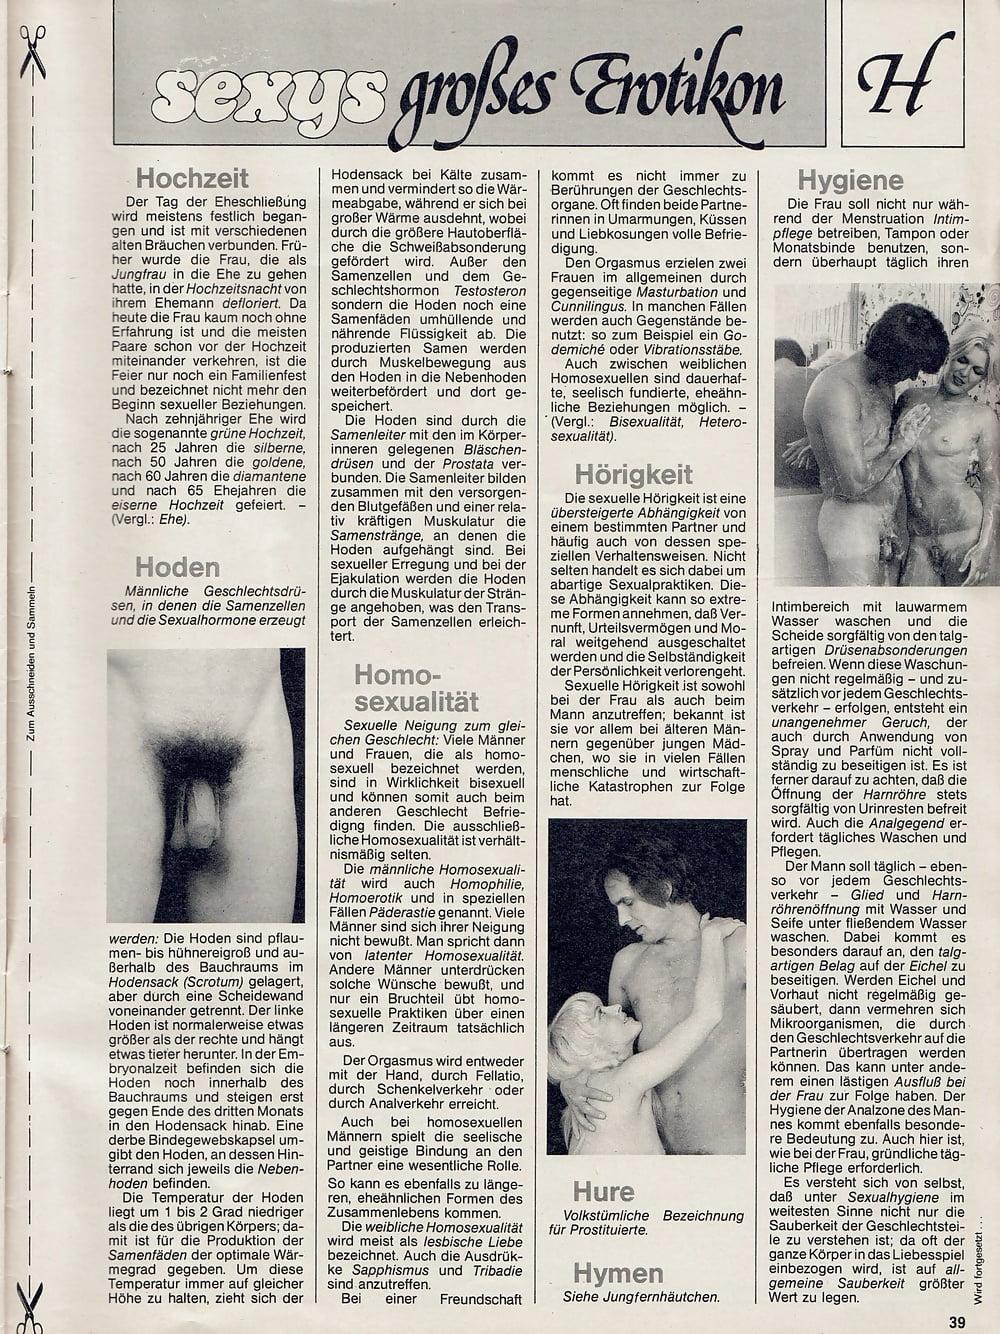 Fantasmes de femmes 1984 - 3 10